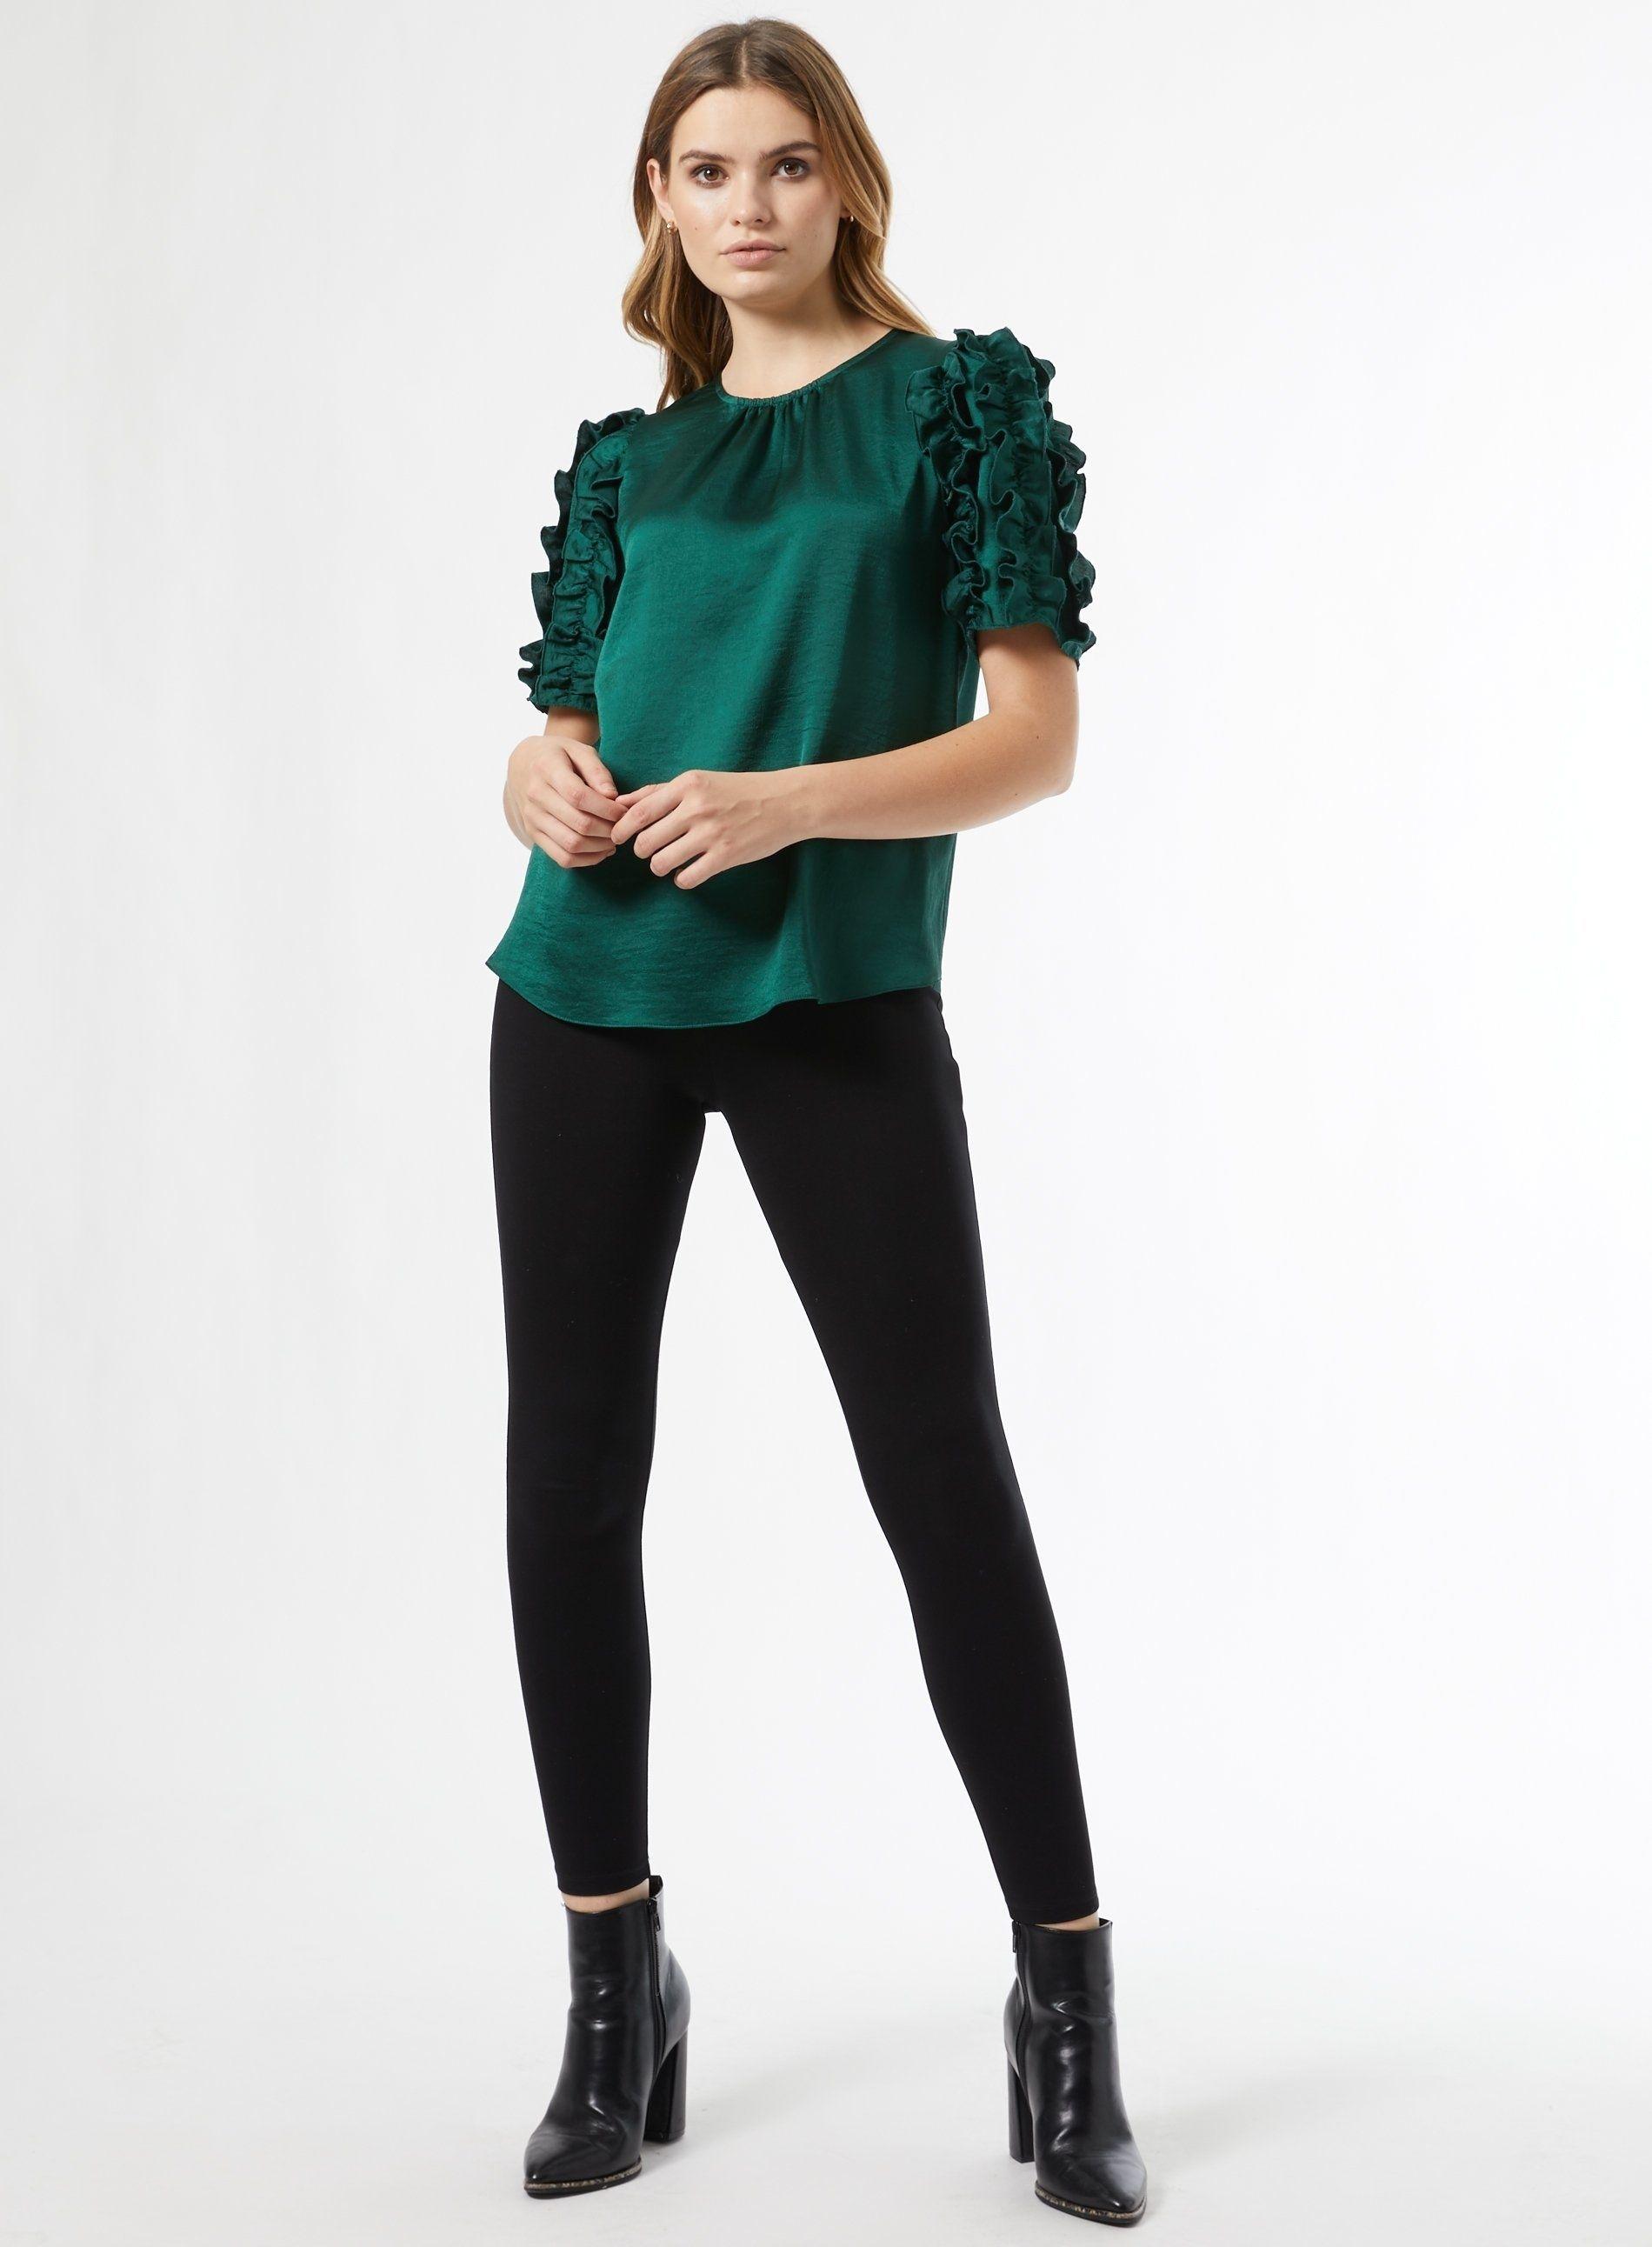 Dorothy Perkins Womens Green 3D Sleeve Top Shirt Blouse Round Neck Long Sleeve